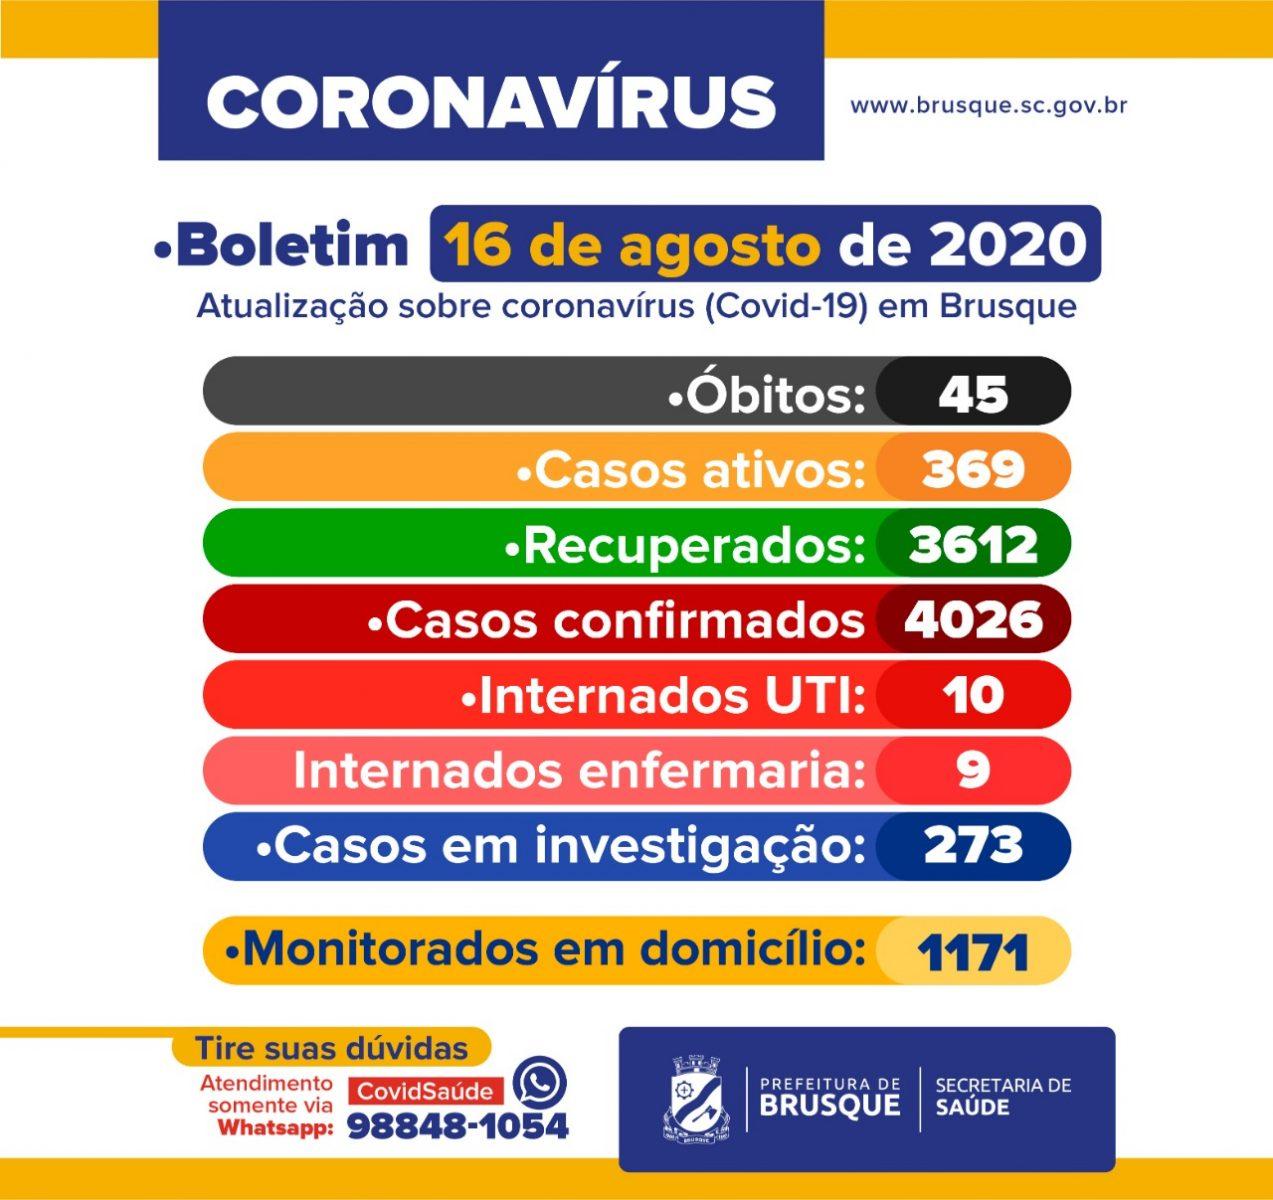 COVID-19: Boletim epidemiológico 16 de agosto